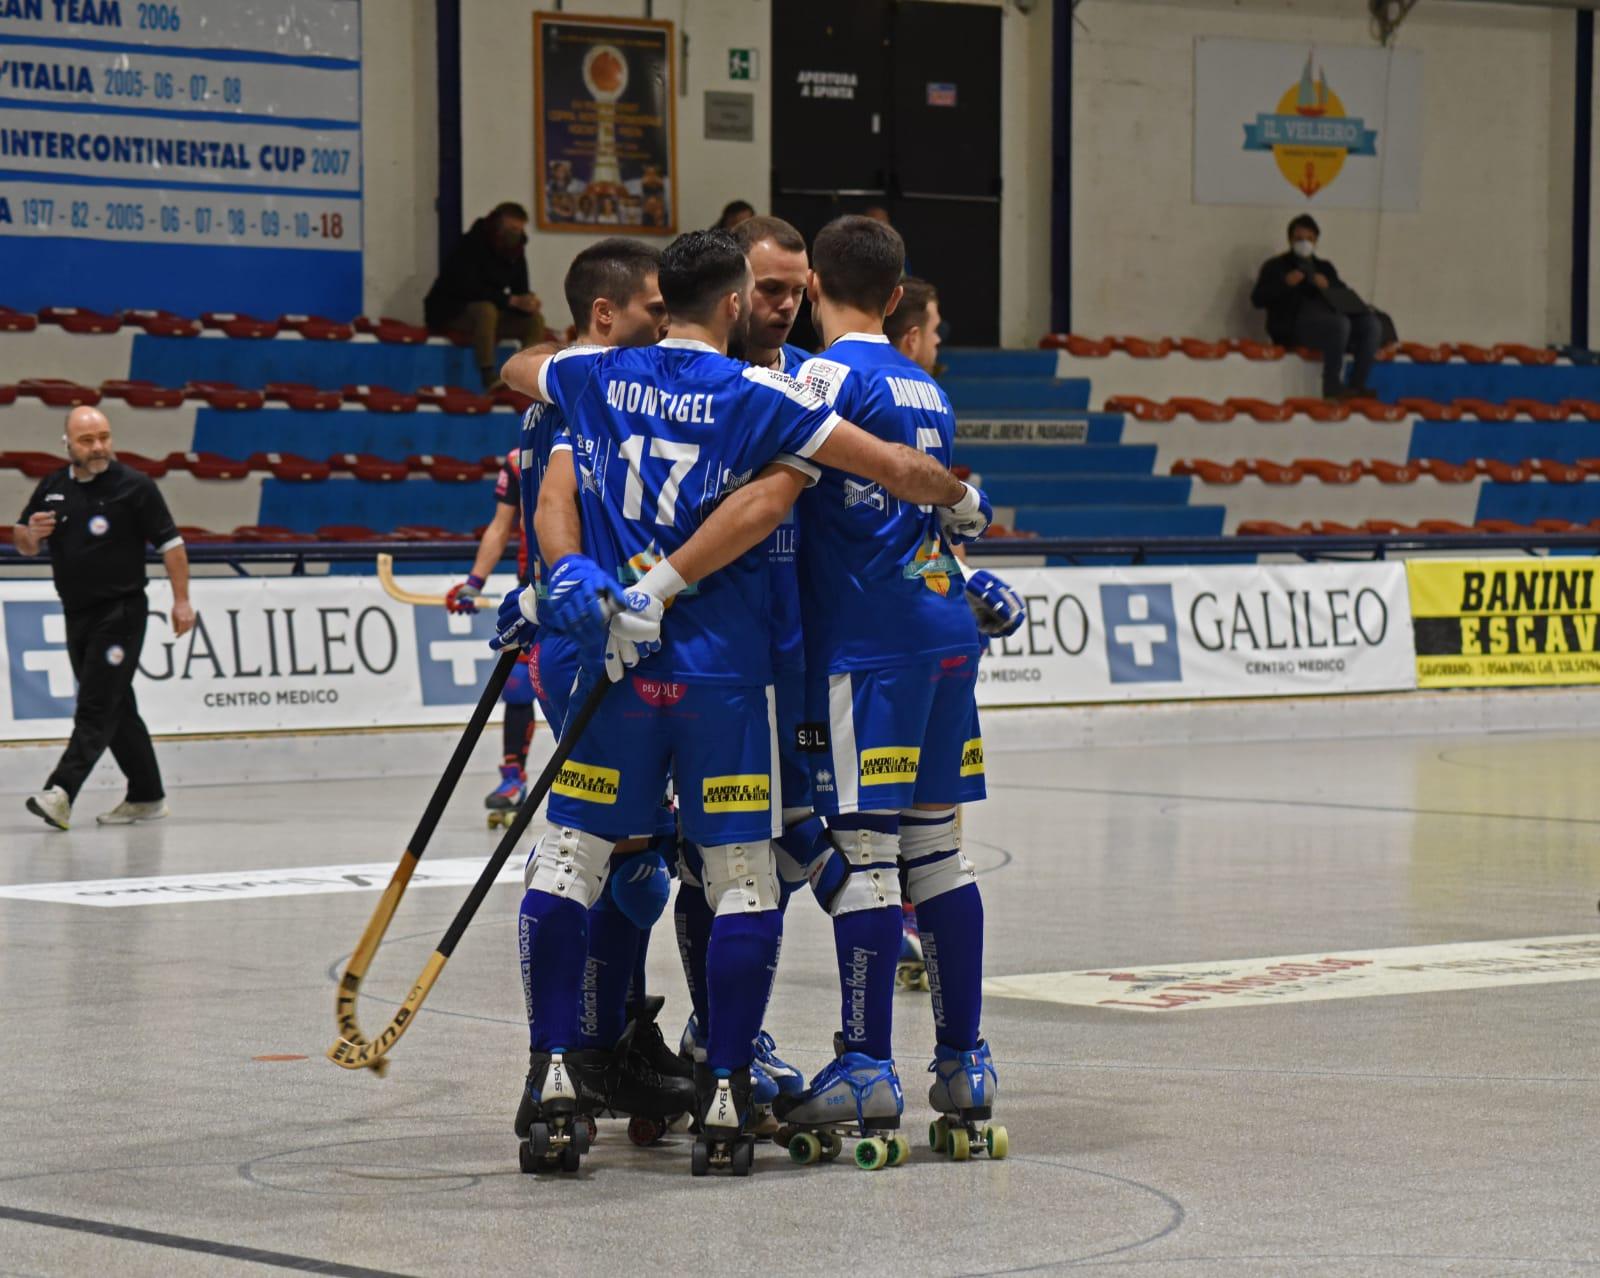 Hockey Galileo Follonica